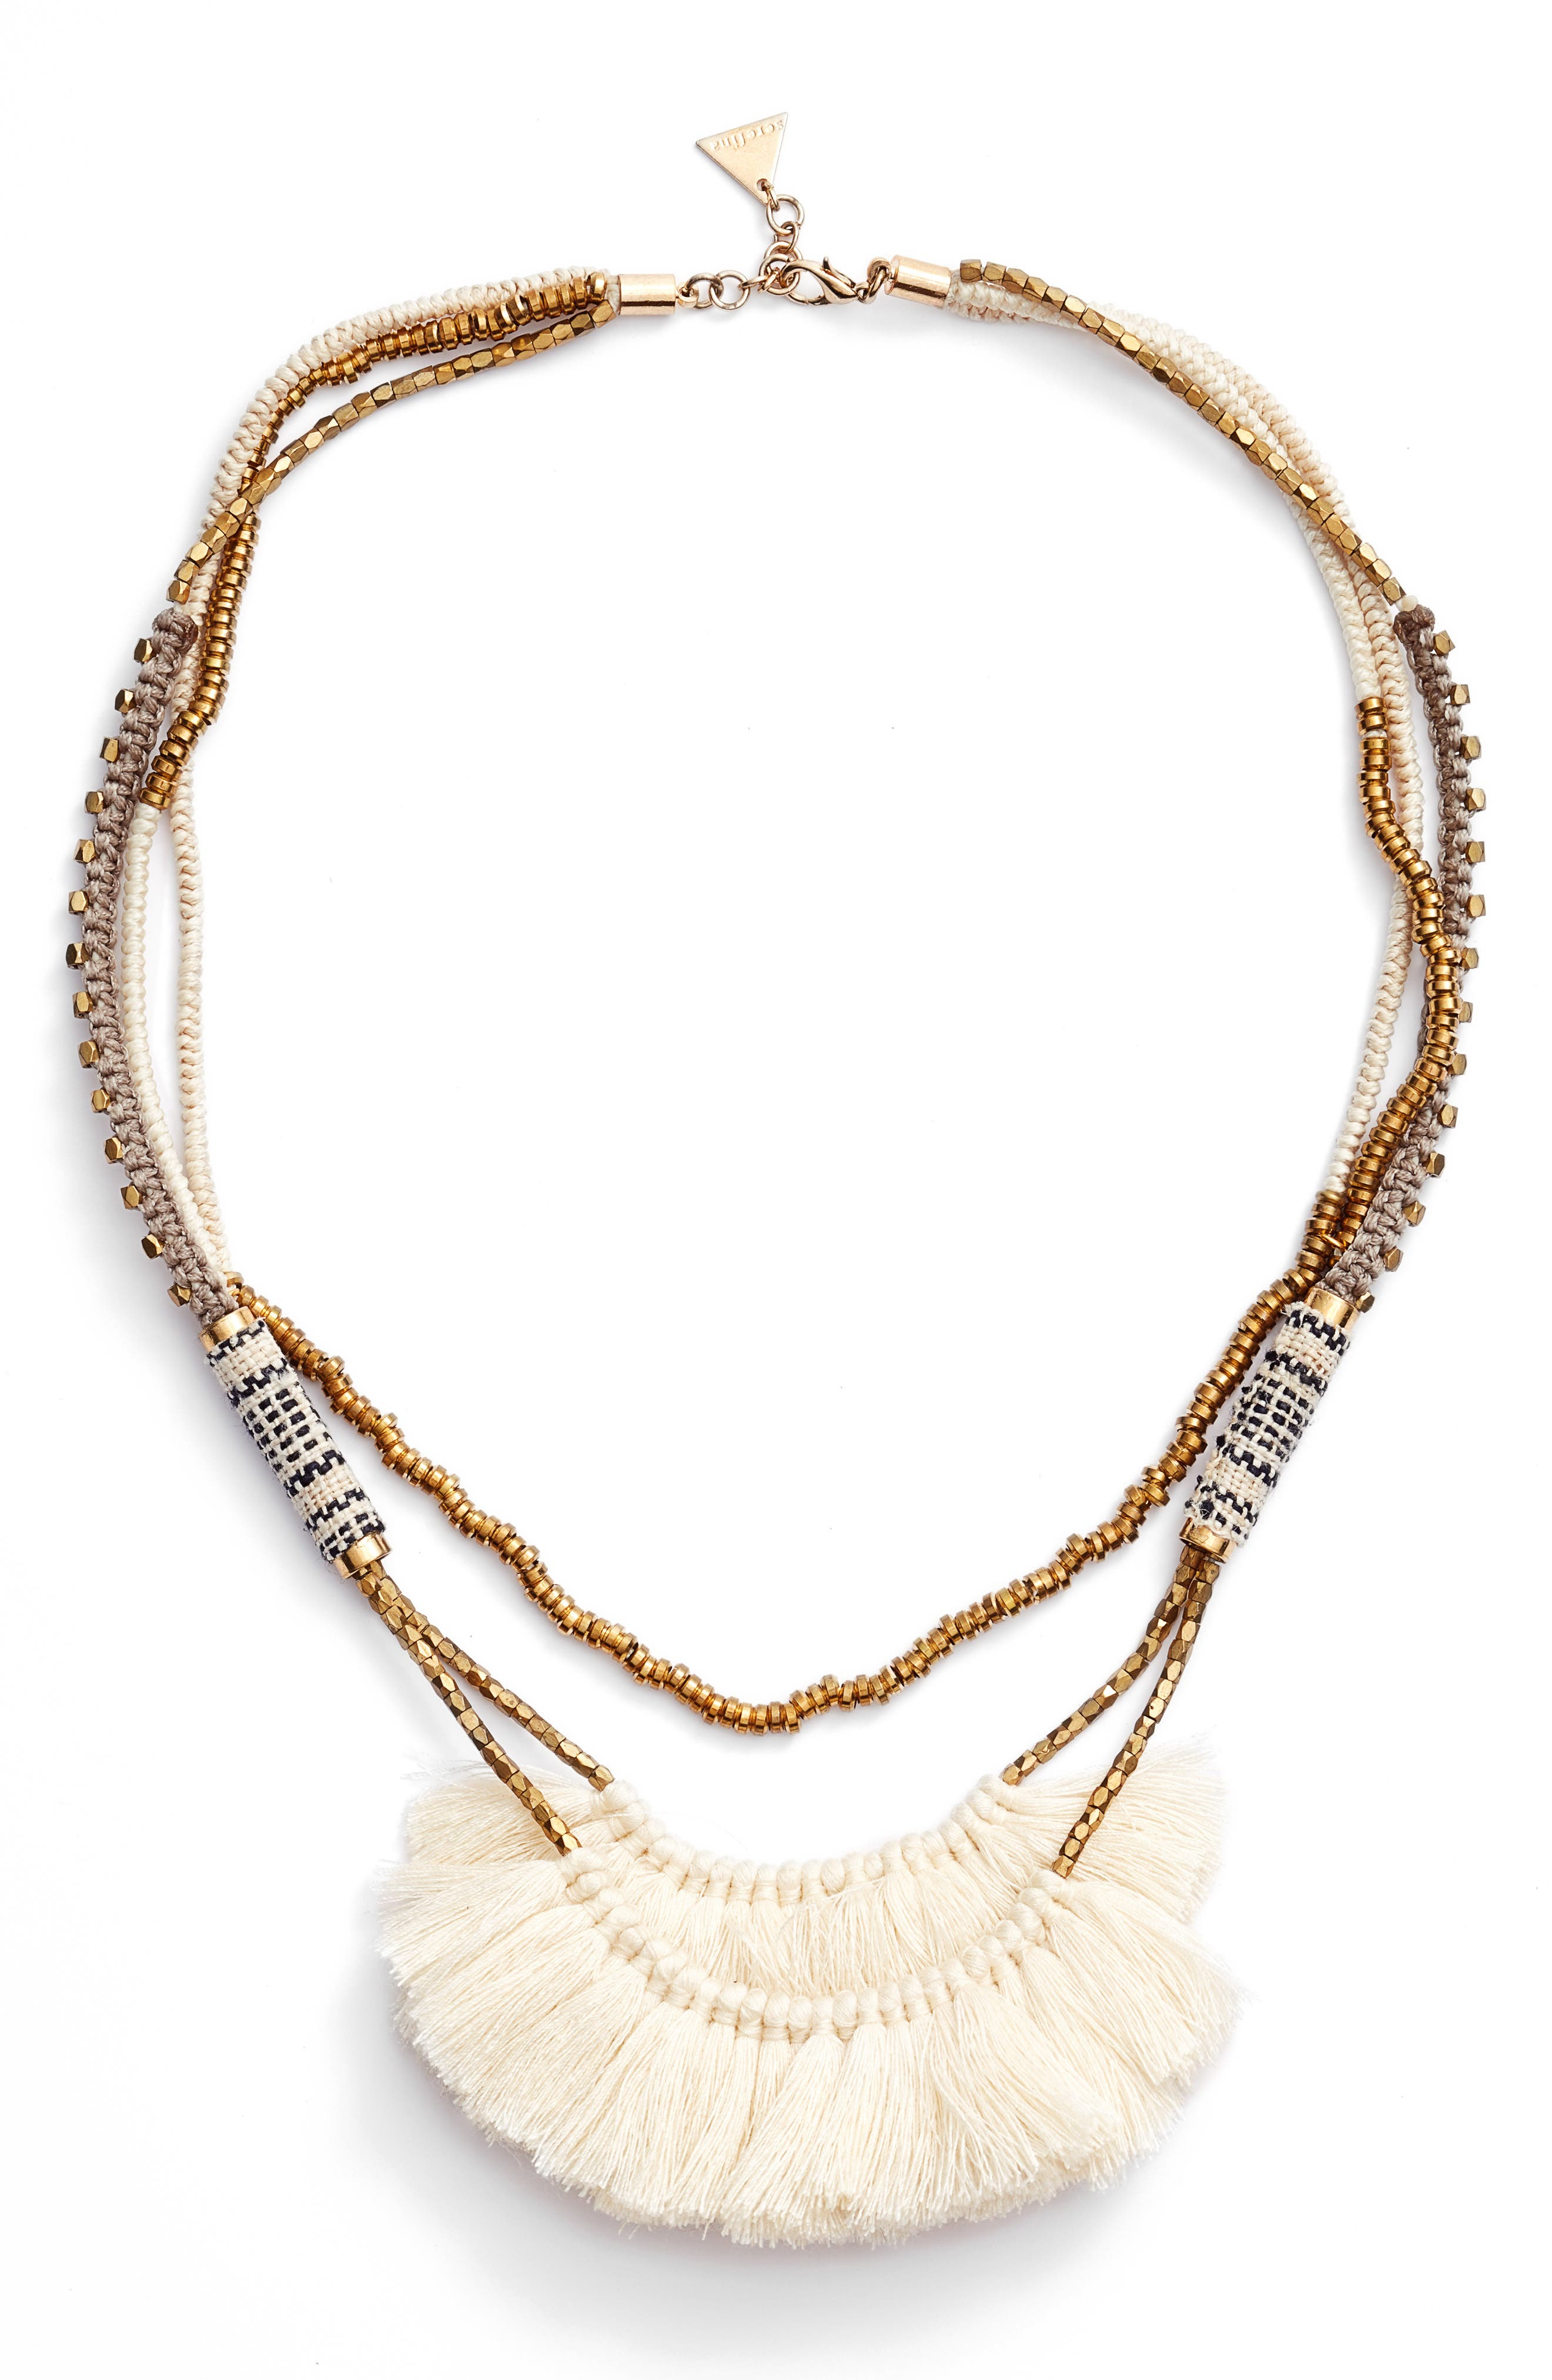 SEREFINA Tassel Statement Necklace, Main, color, 100